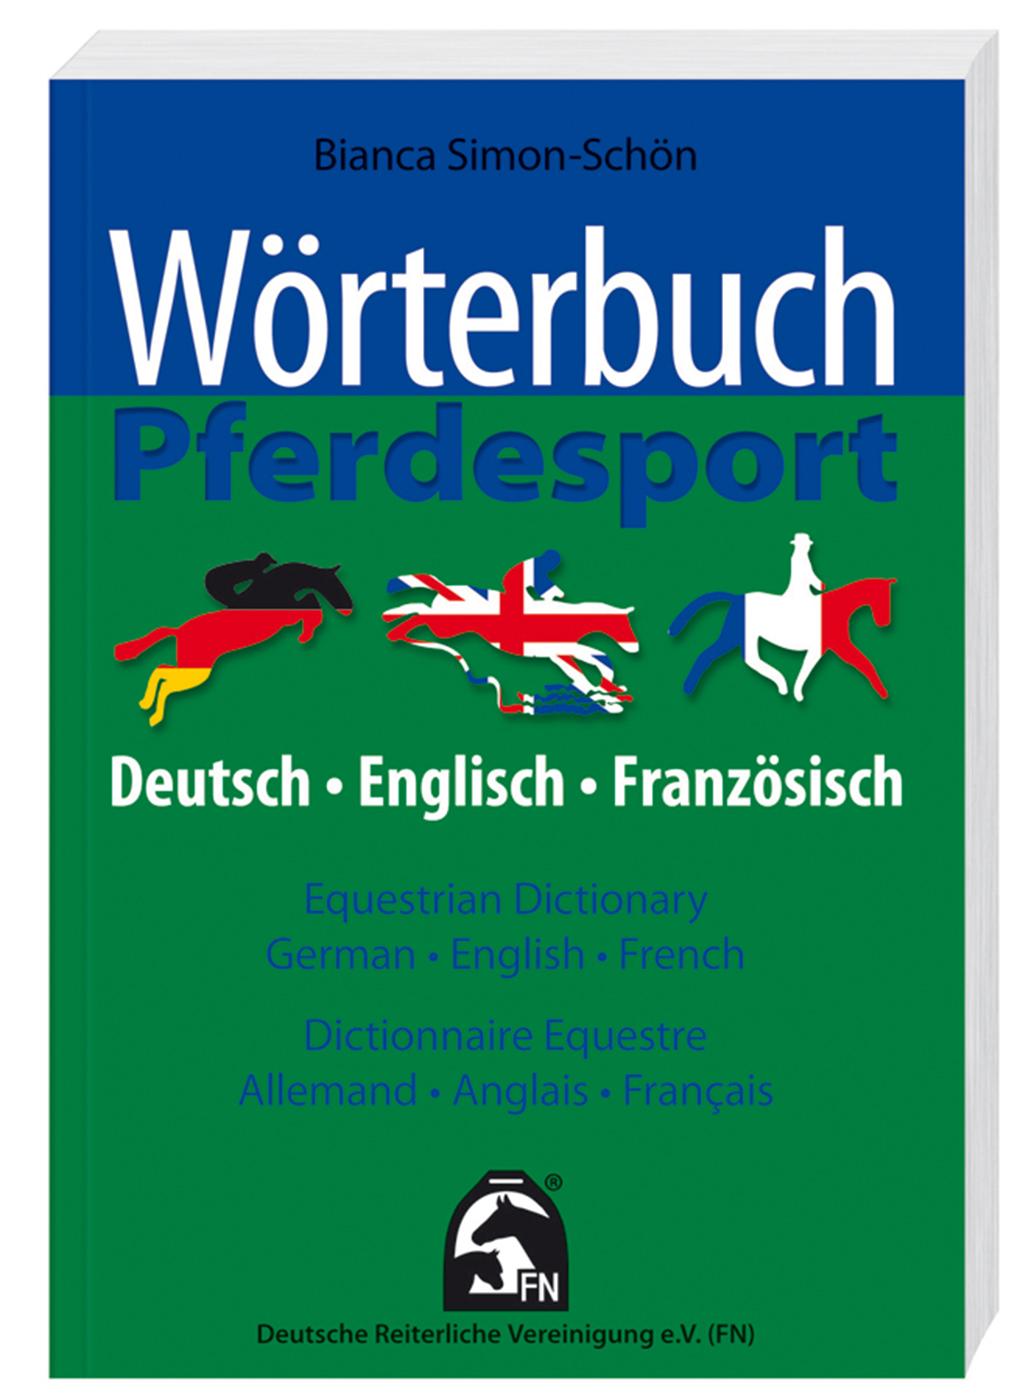 Busse Wörterbuch Pferdesport/Equestrian Dictionary